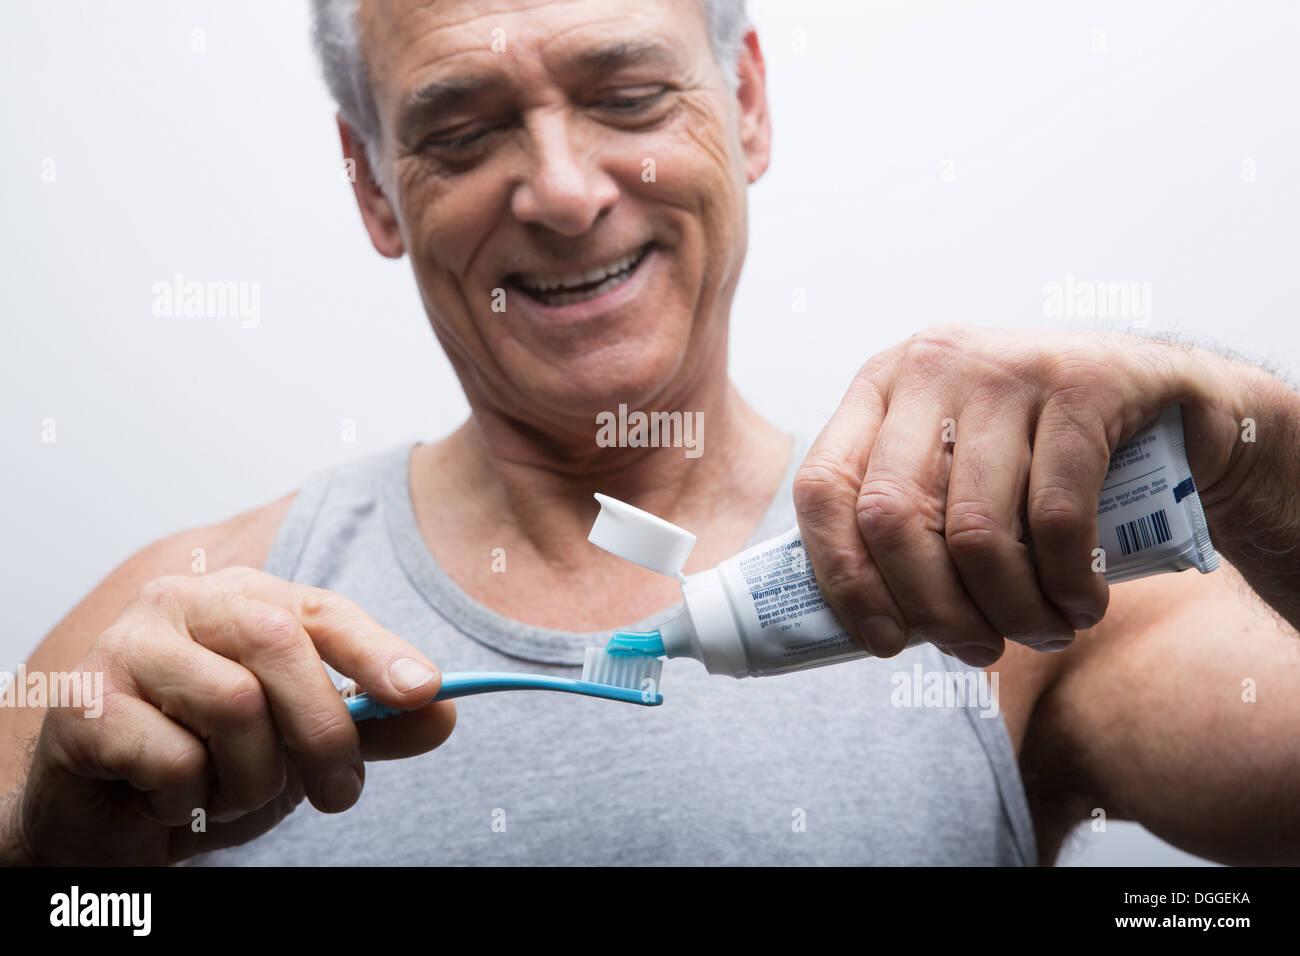 Senior man squeezing toothpaste onto brush - Stock Image